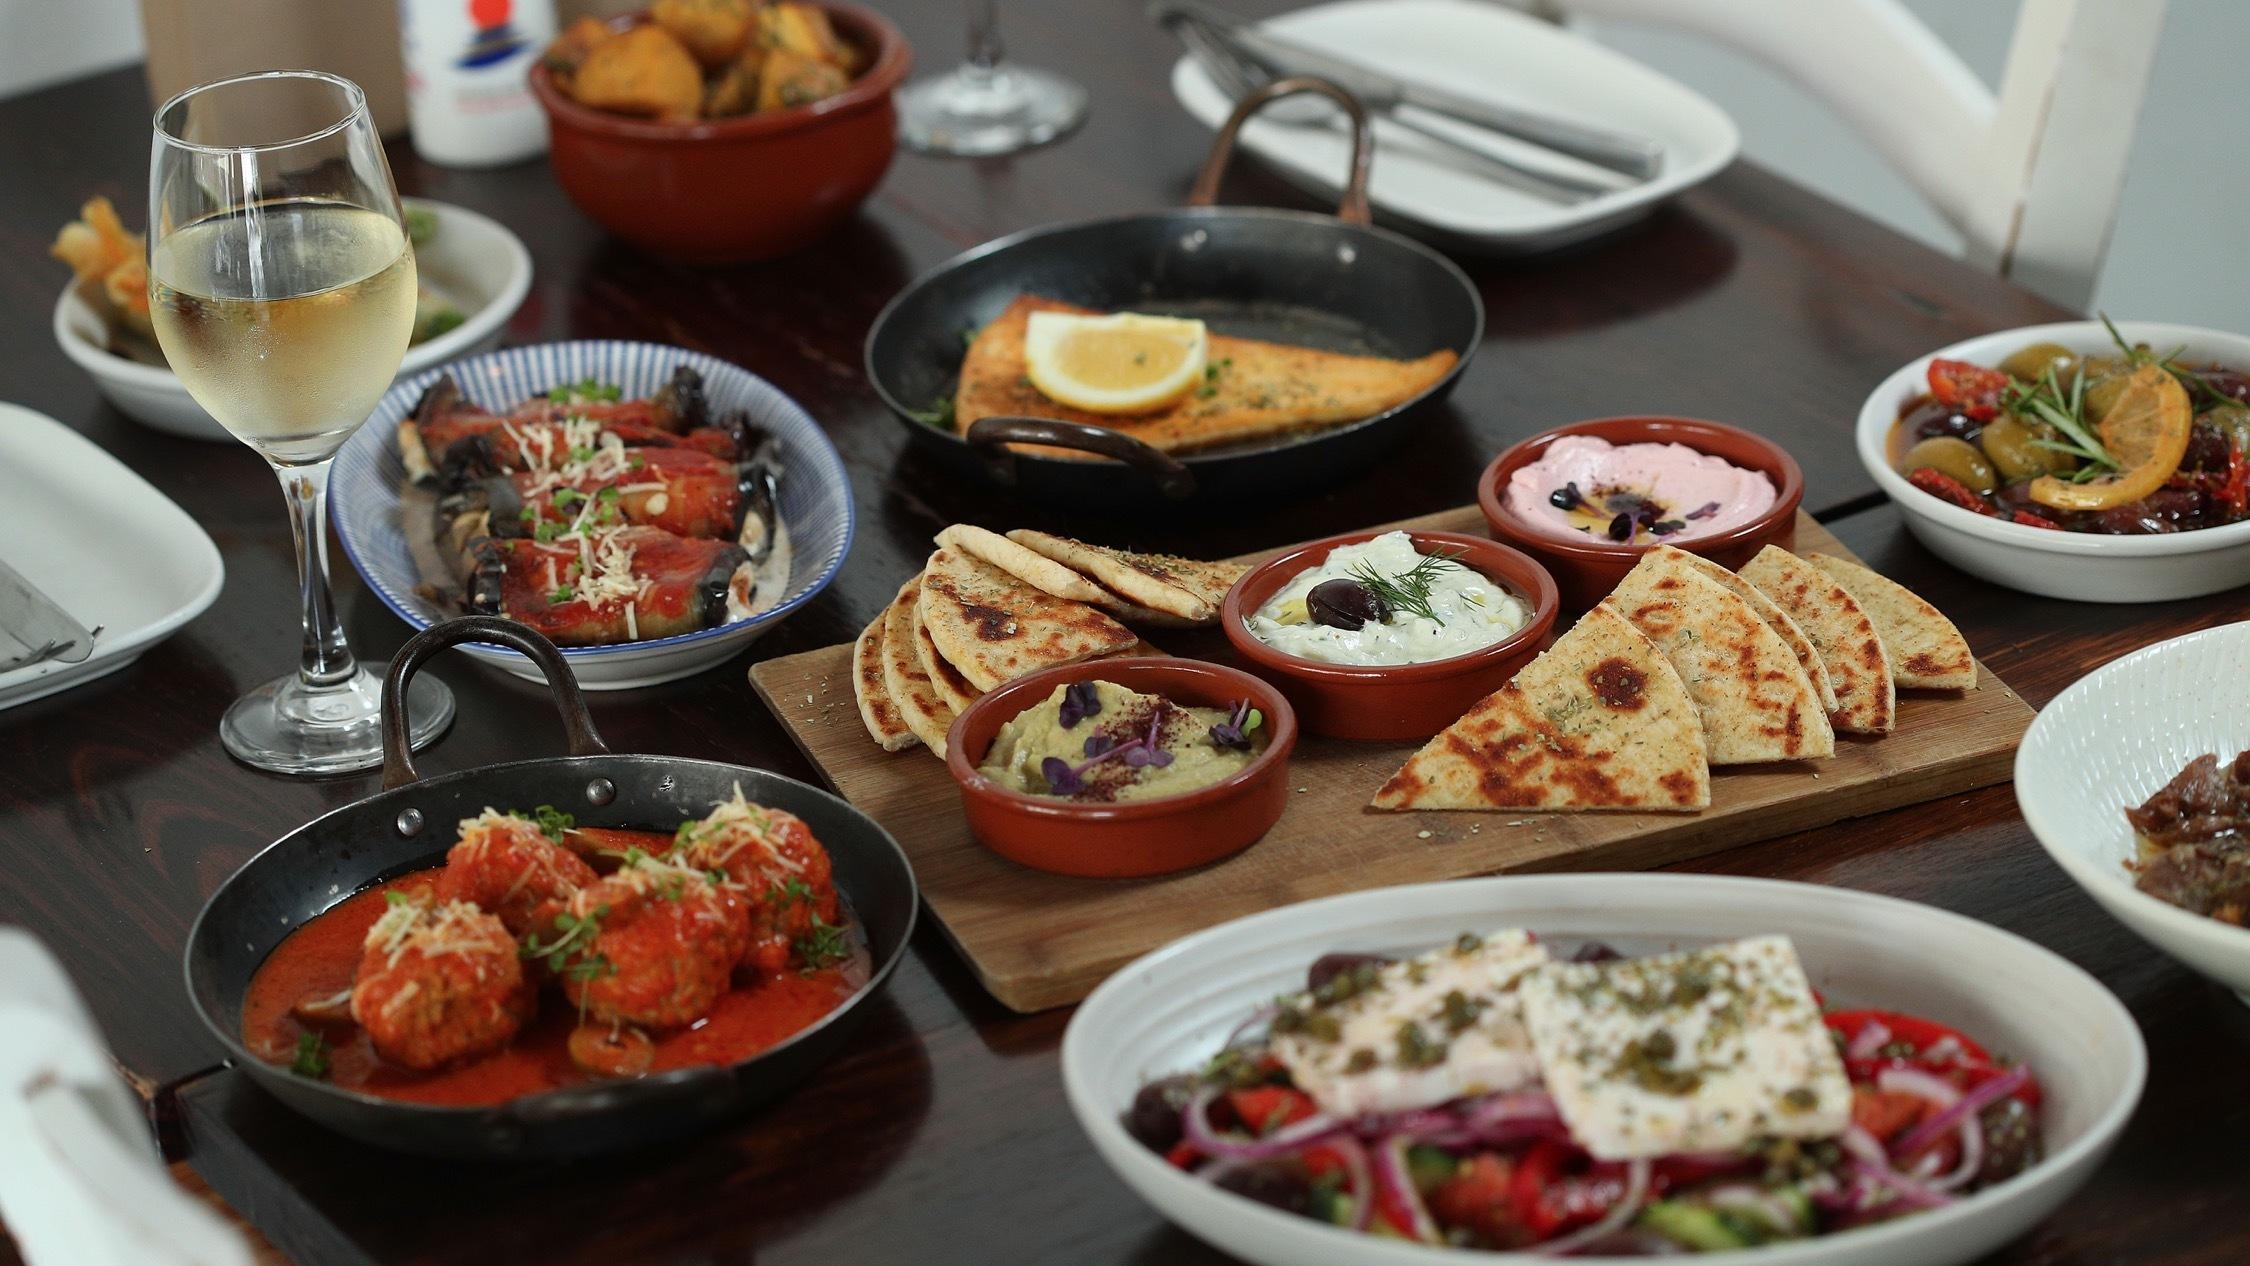 Table of food at Bahari Melbourne